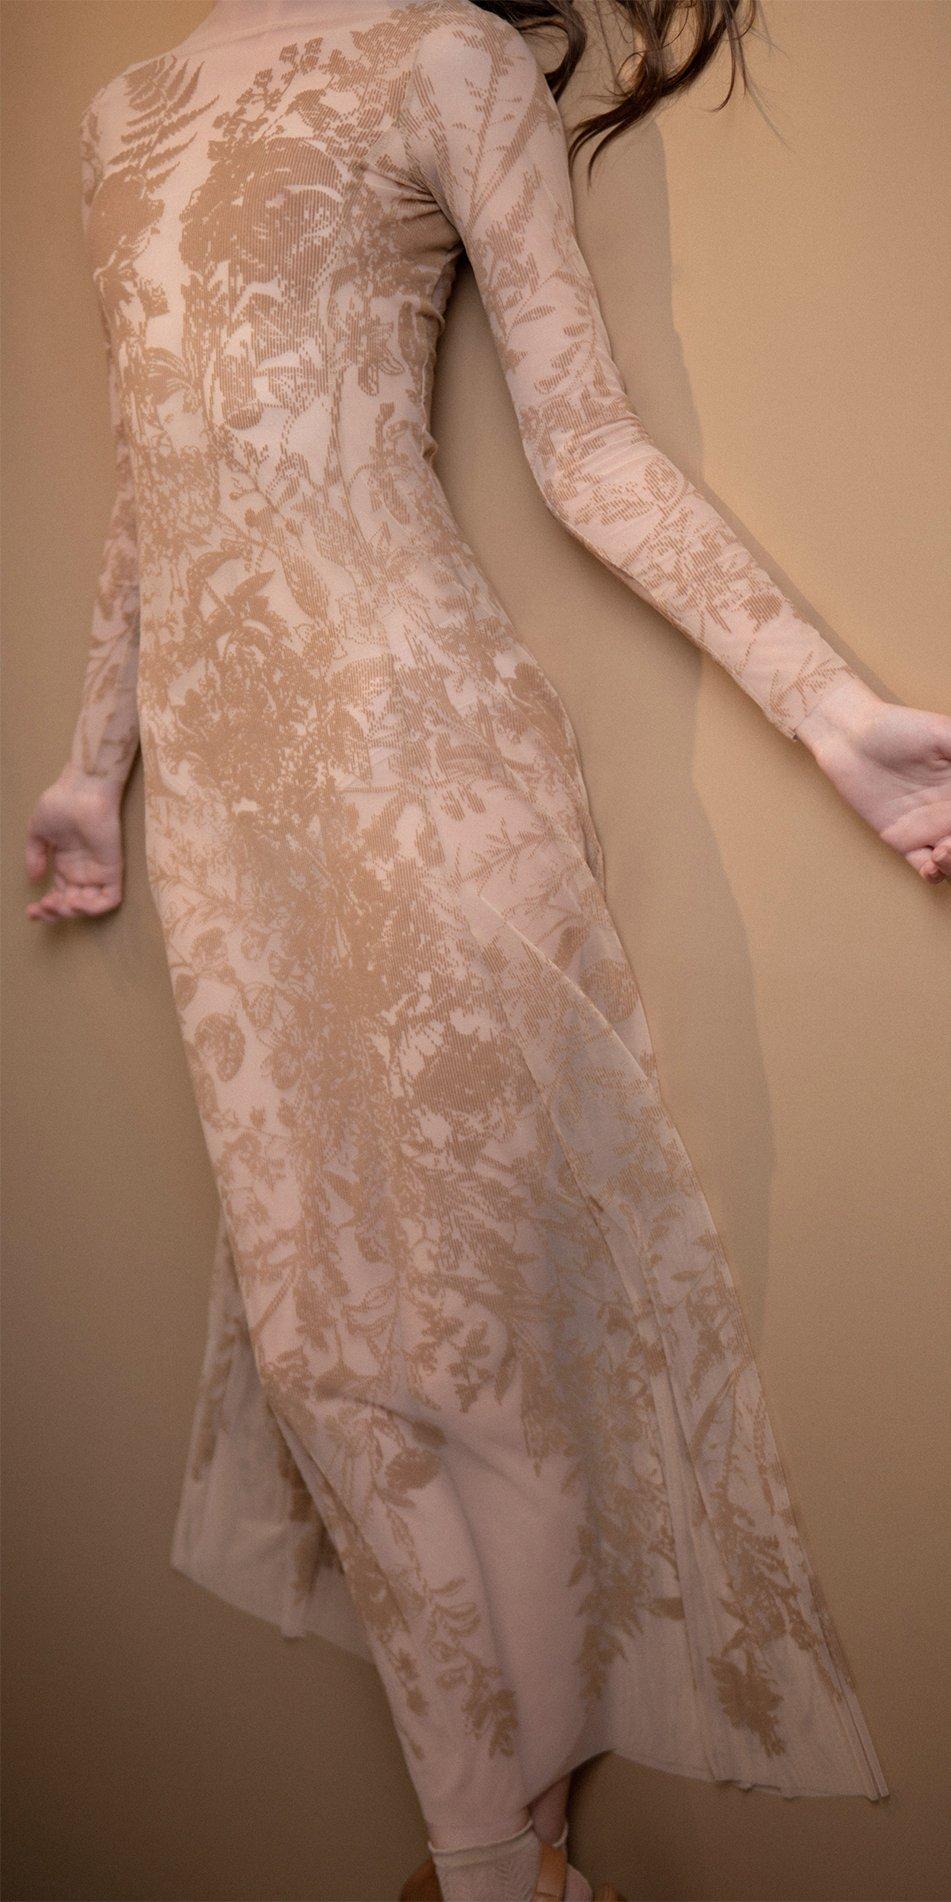 BLOSSOMS nude second skin flock print dress 3